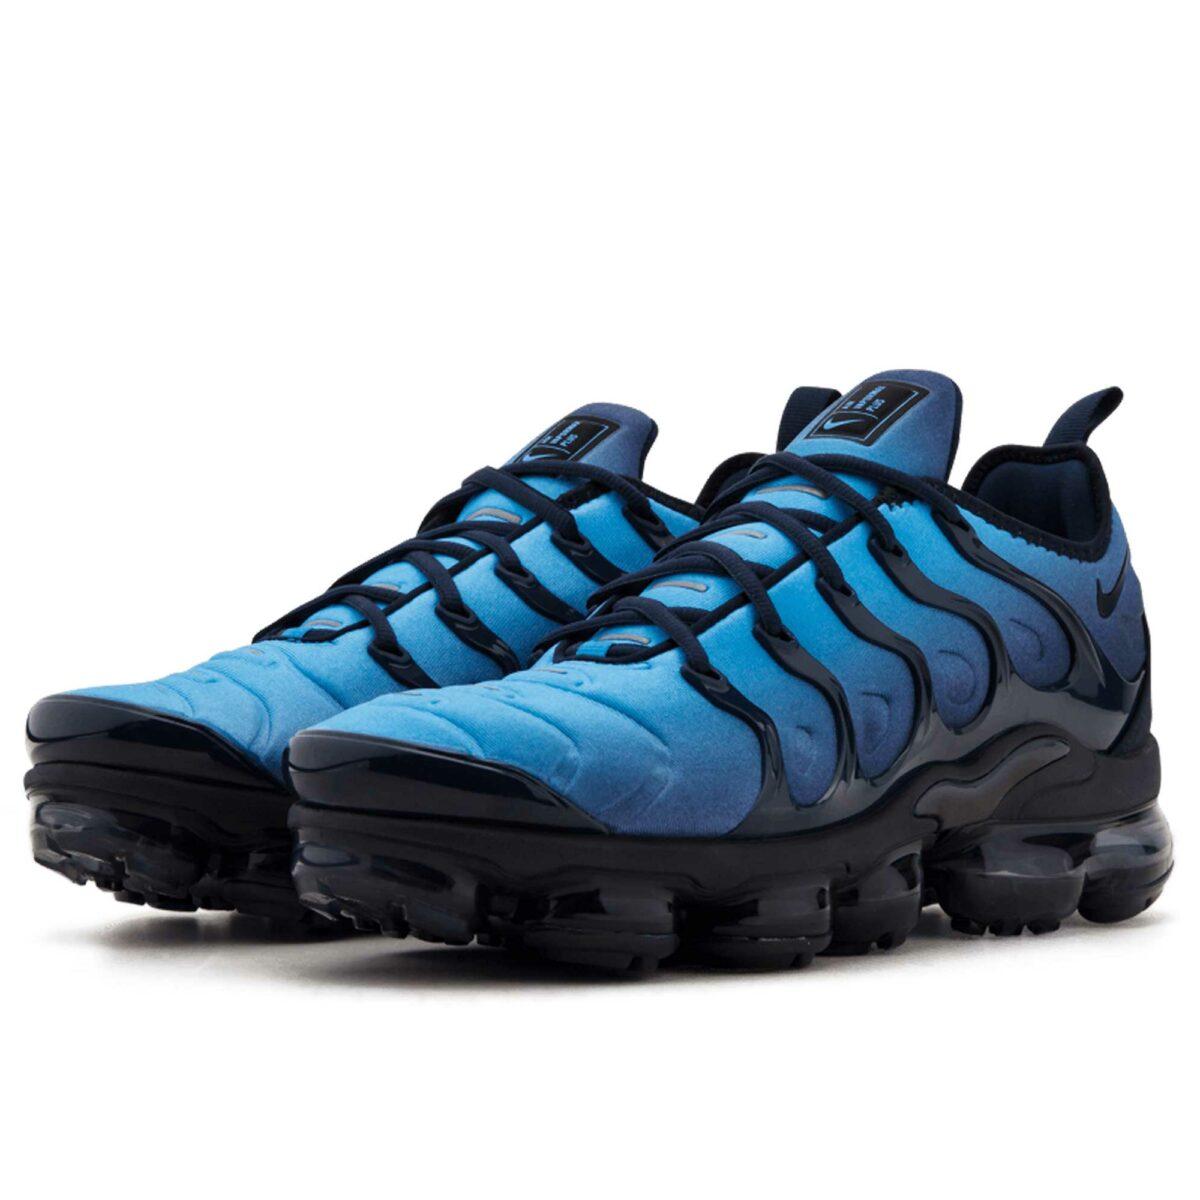 nike air vapormax plus blue 24453_401 купить